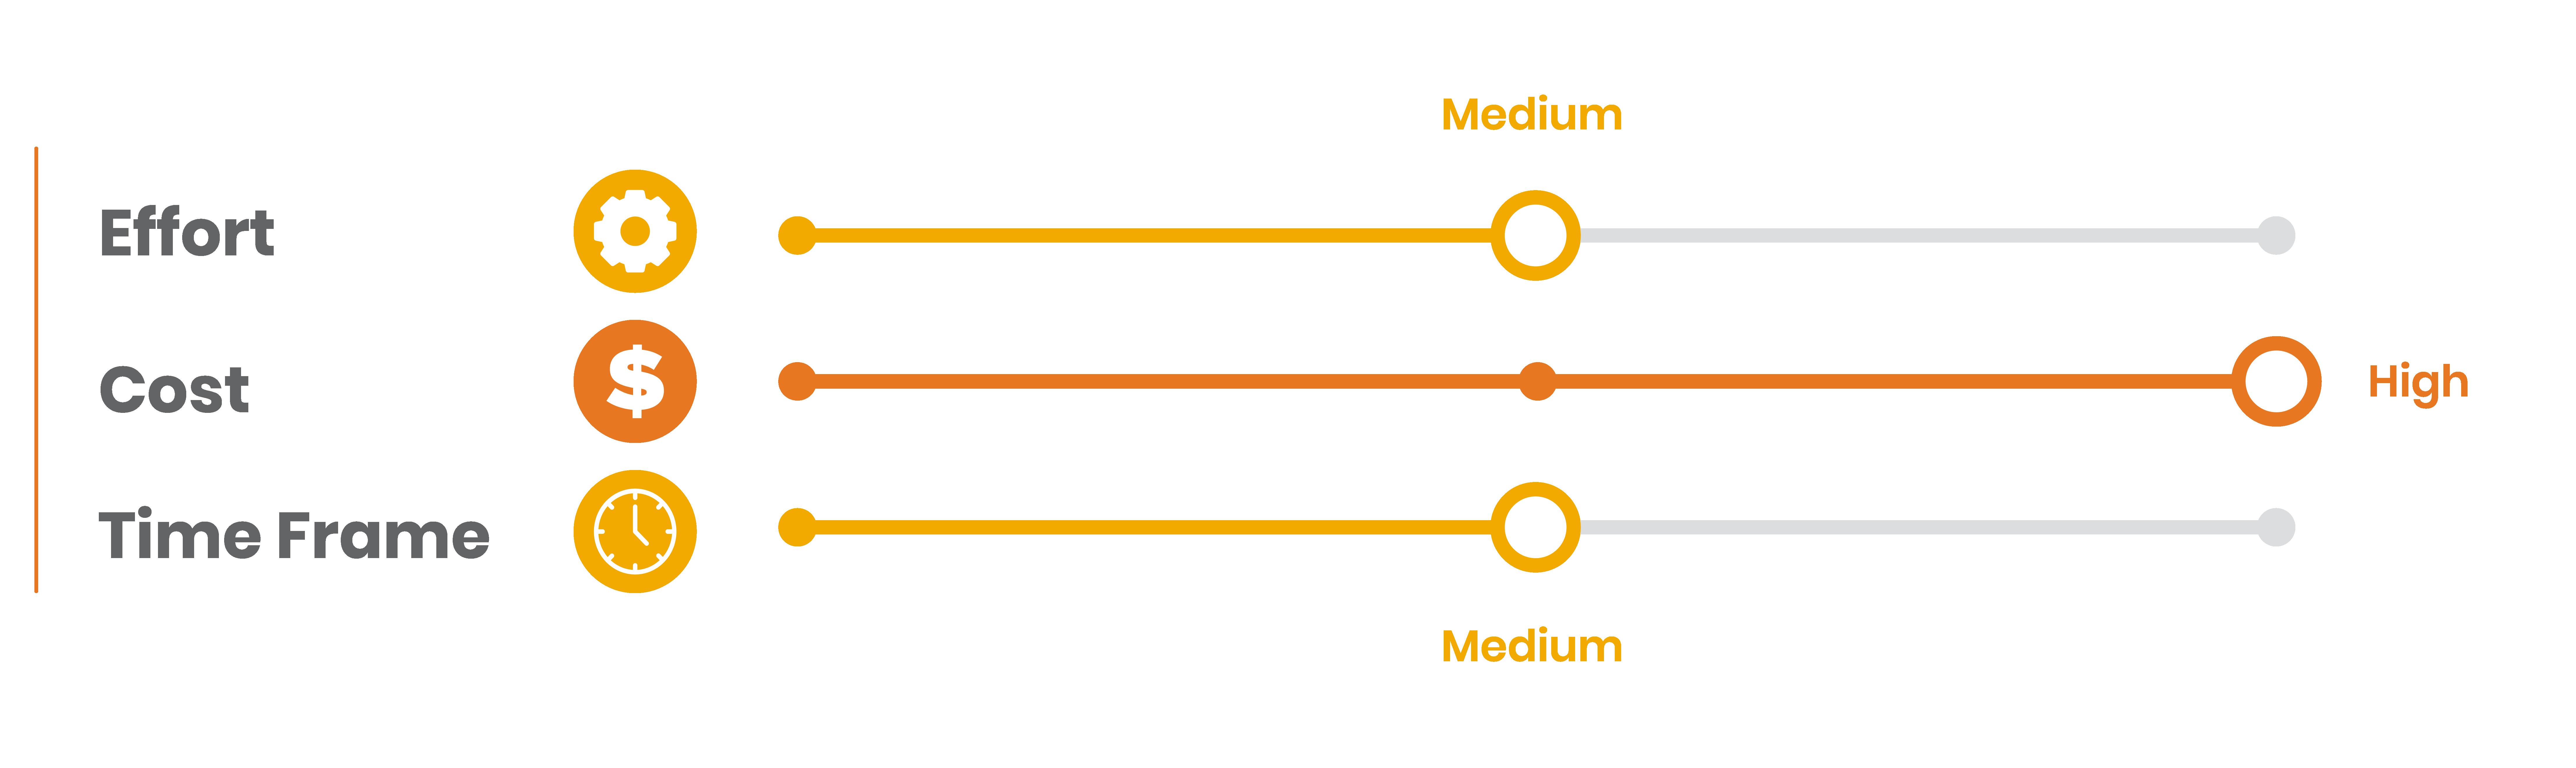 11.Bar side graphic with three metrics effort medium risk, cost high risk, time frame medium risk